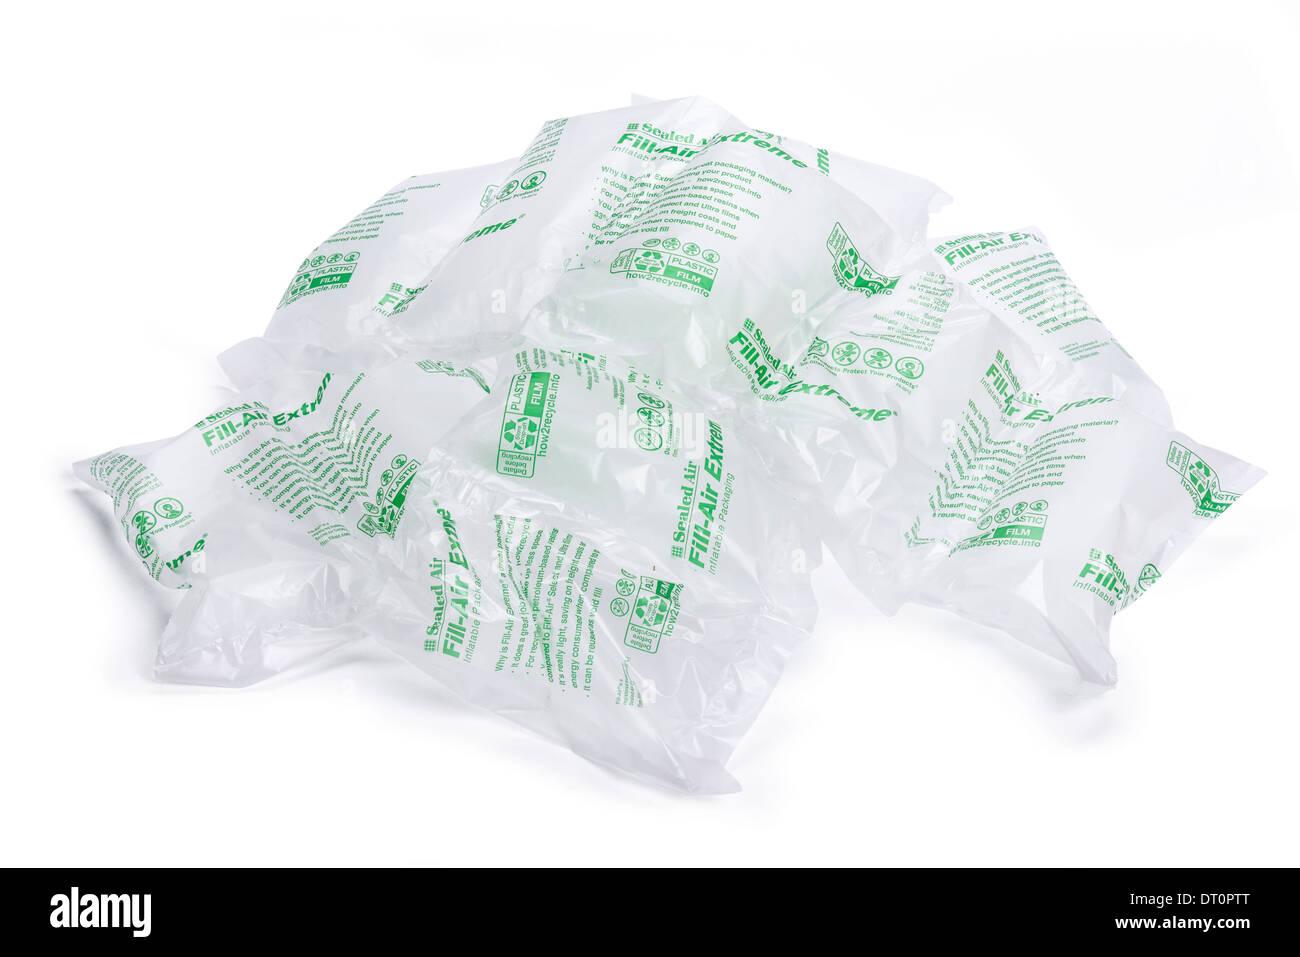 Bolsa de aire material de embalaje inflable Sealed Air Imagen De Stock